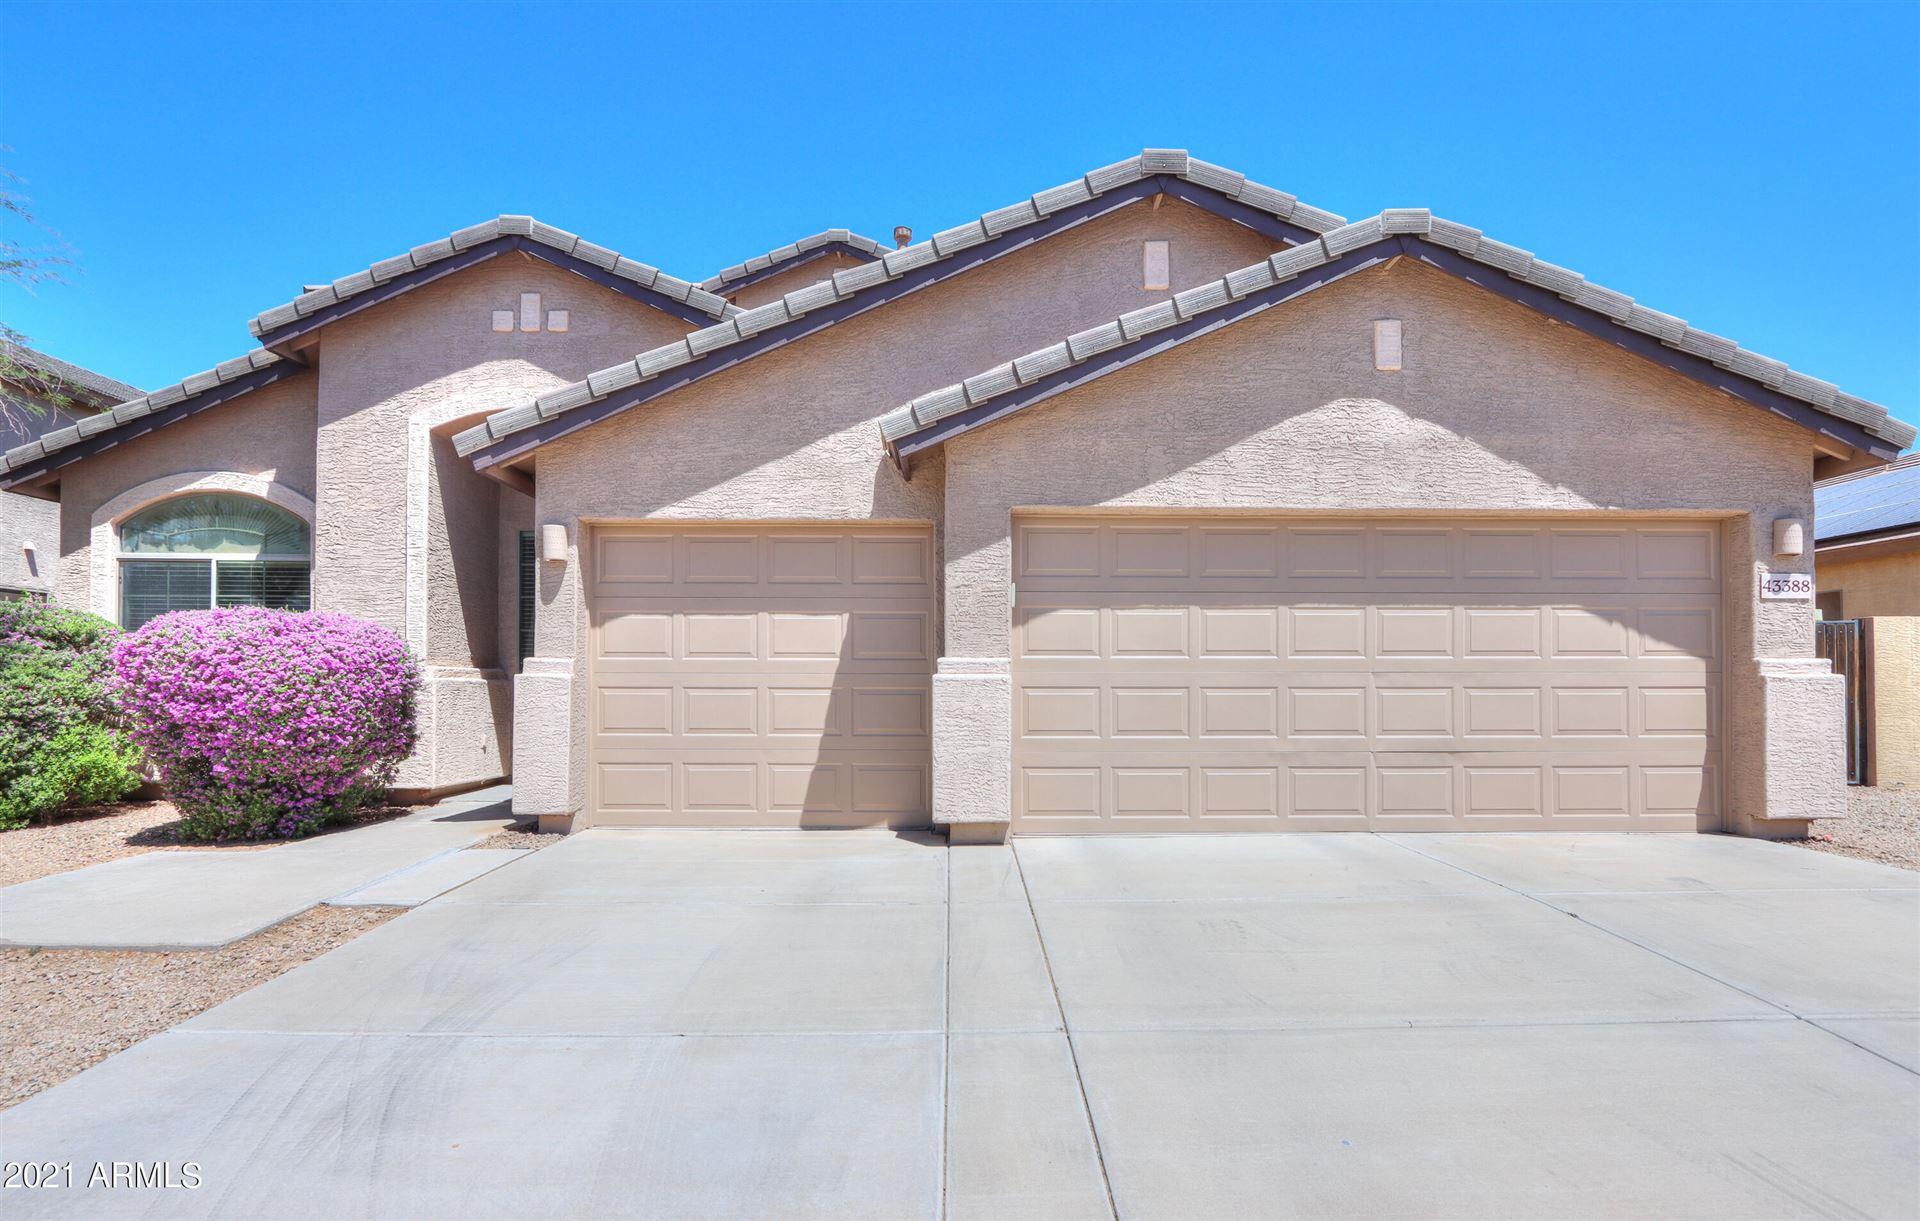 Photo for 43388 W Venture Road, Maricopa, AZ 85138 (MLS # 6245599)